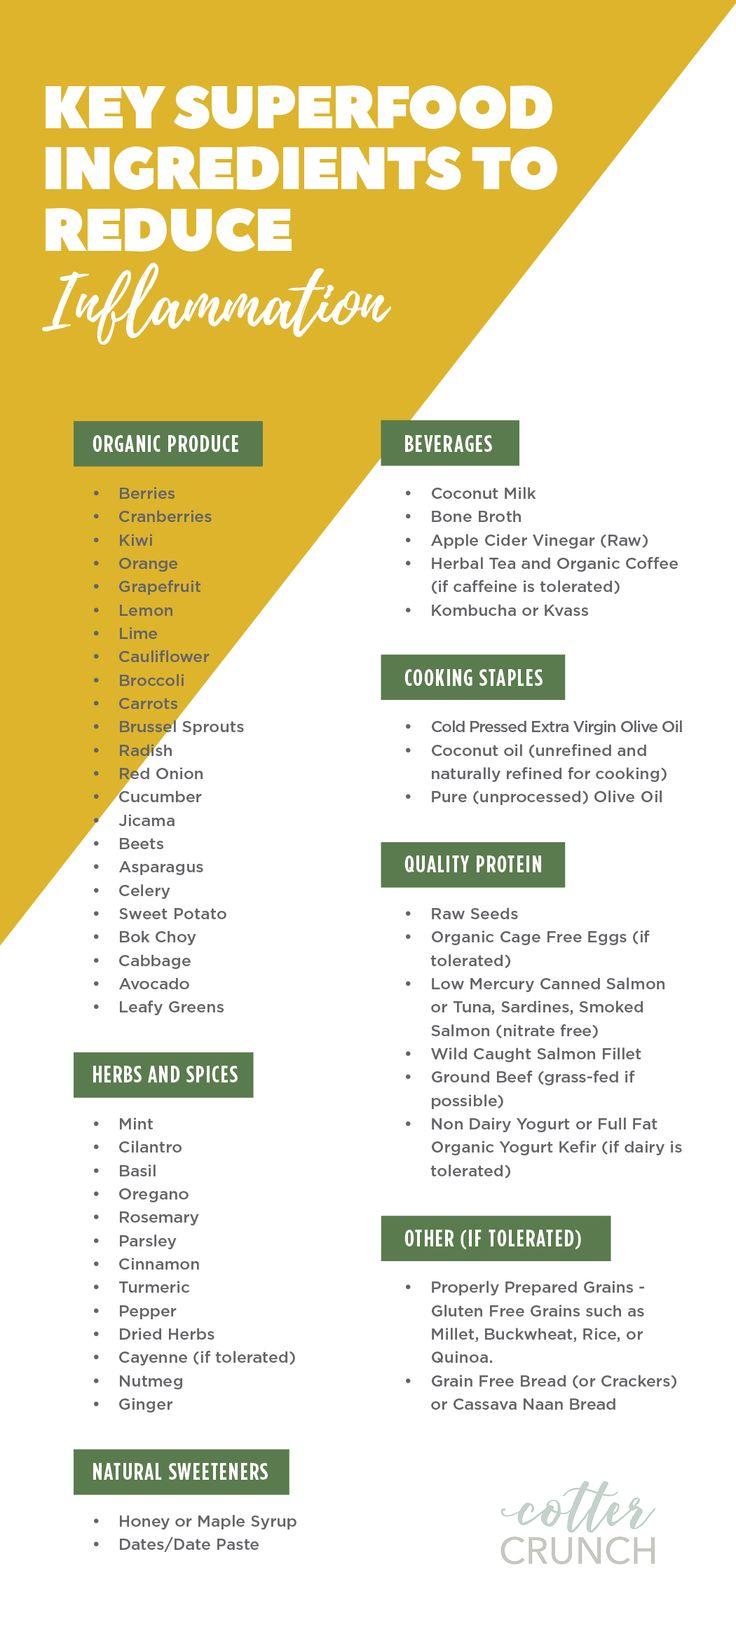 7 Day Anti-Inflammatory Diet Kick Start Or Reset Guide